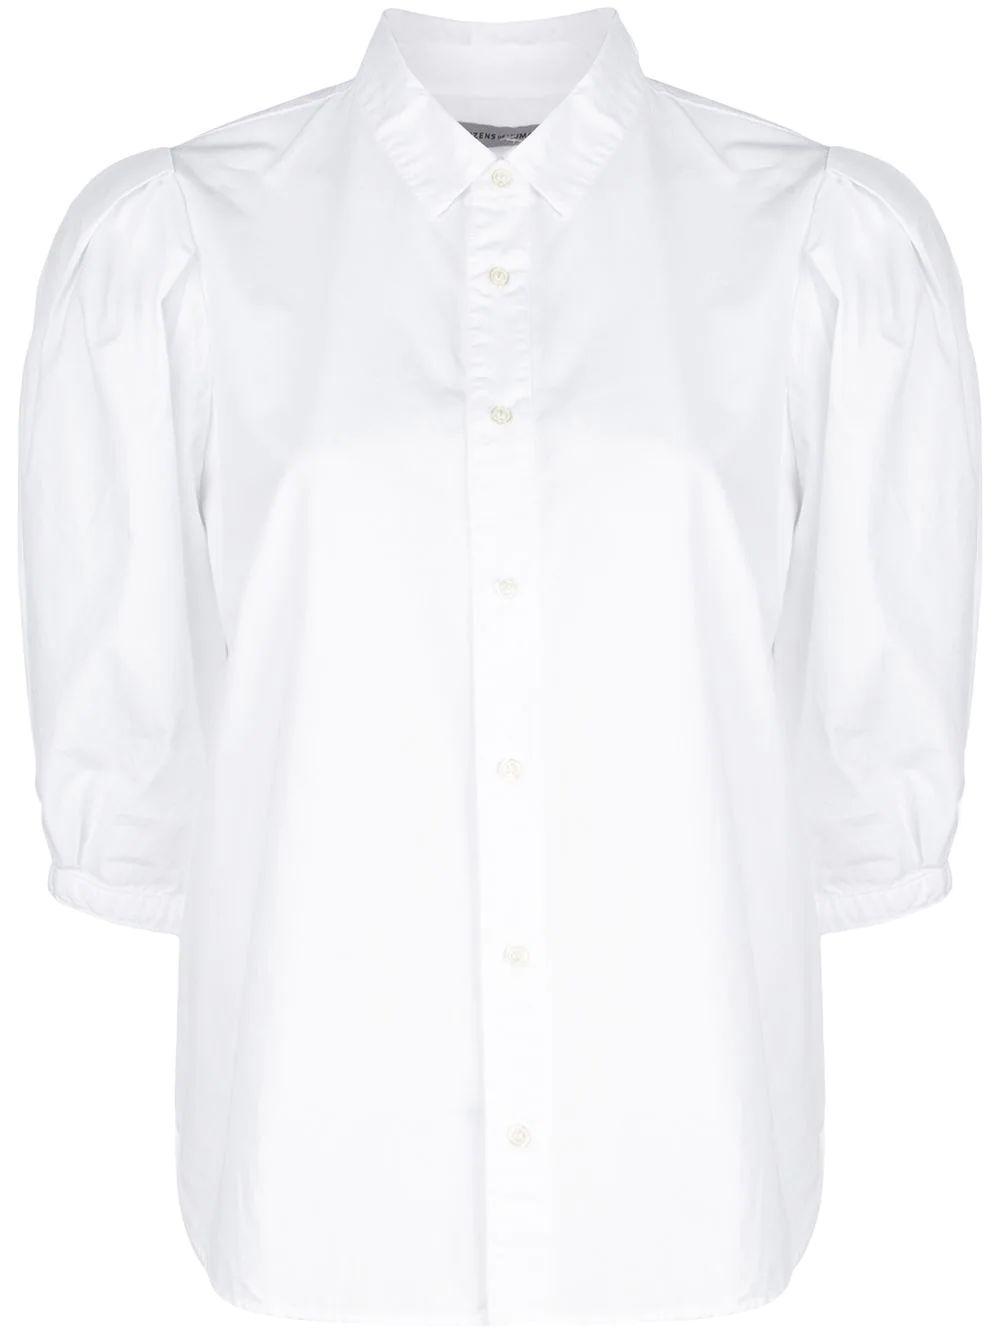 Ines Cotton Shirt Item # 9150-741-F21